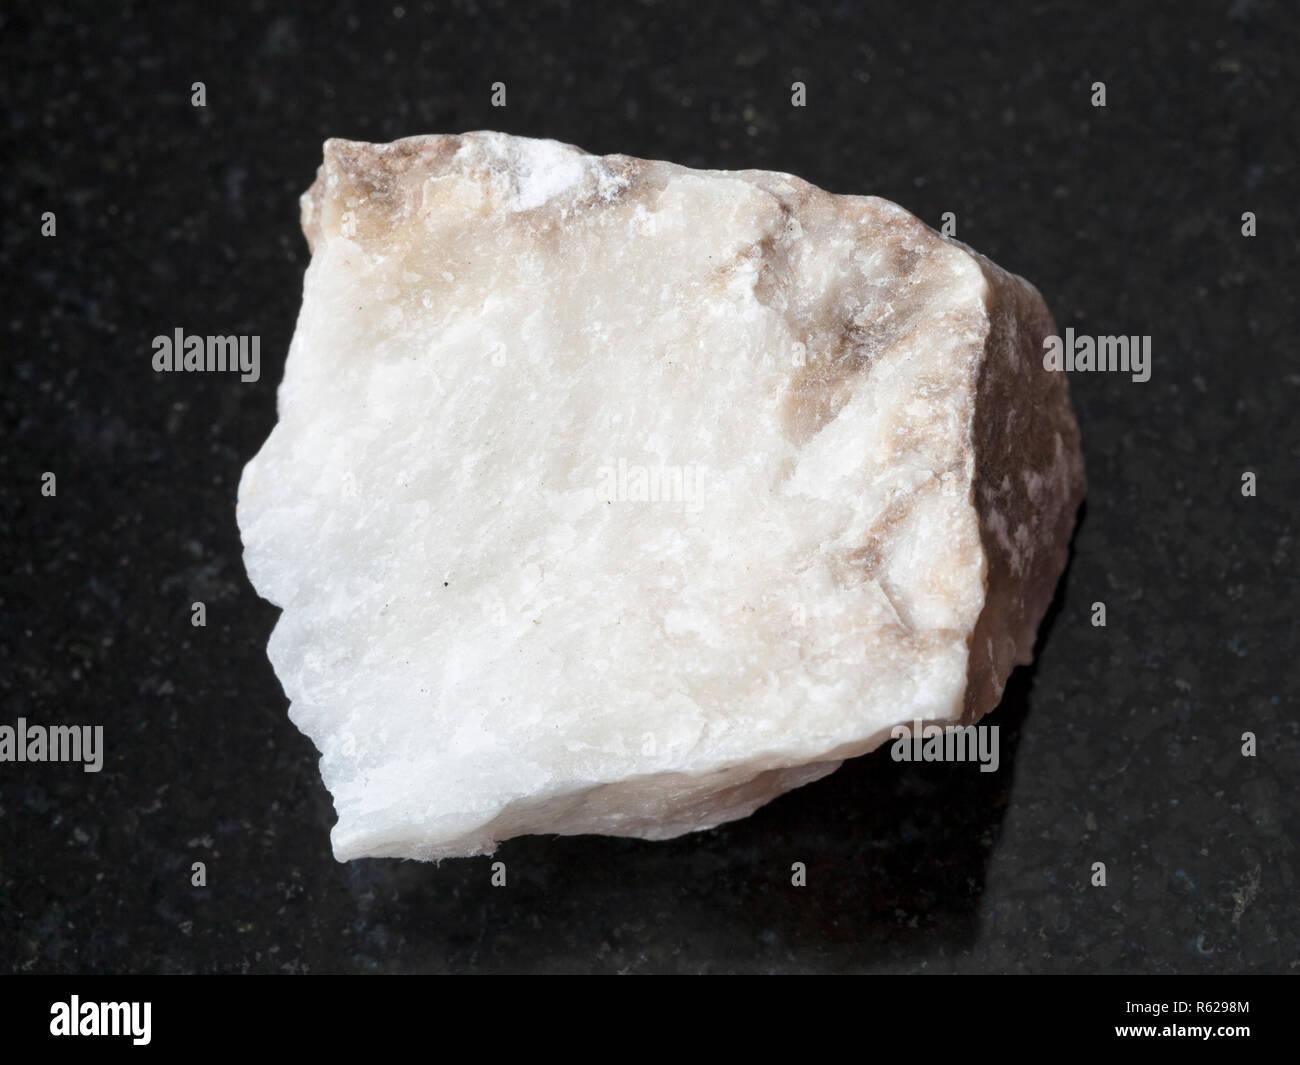 raw Anhydrite stone on dark background - Stock Image